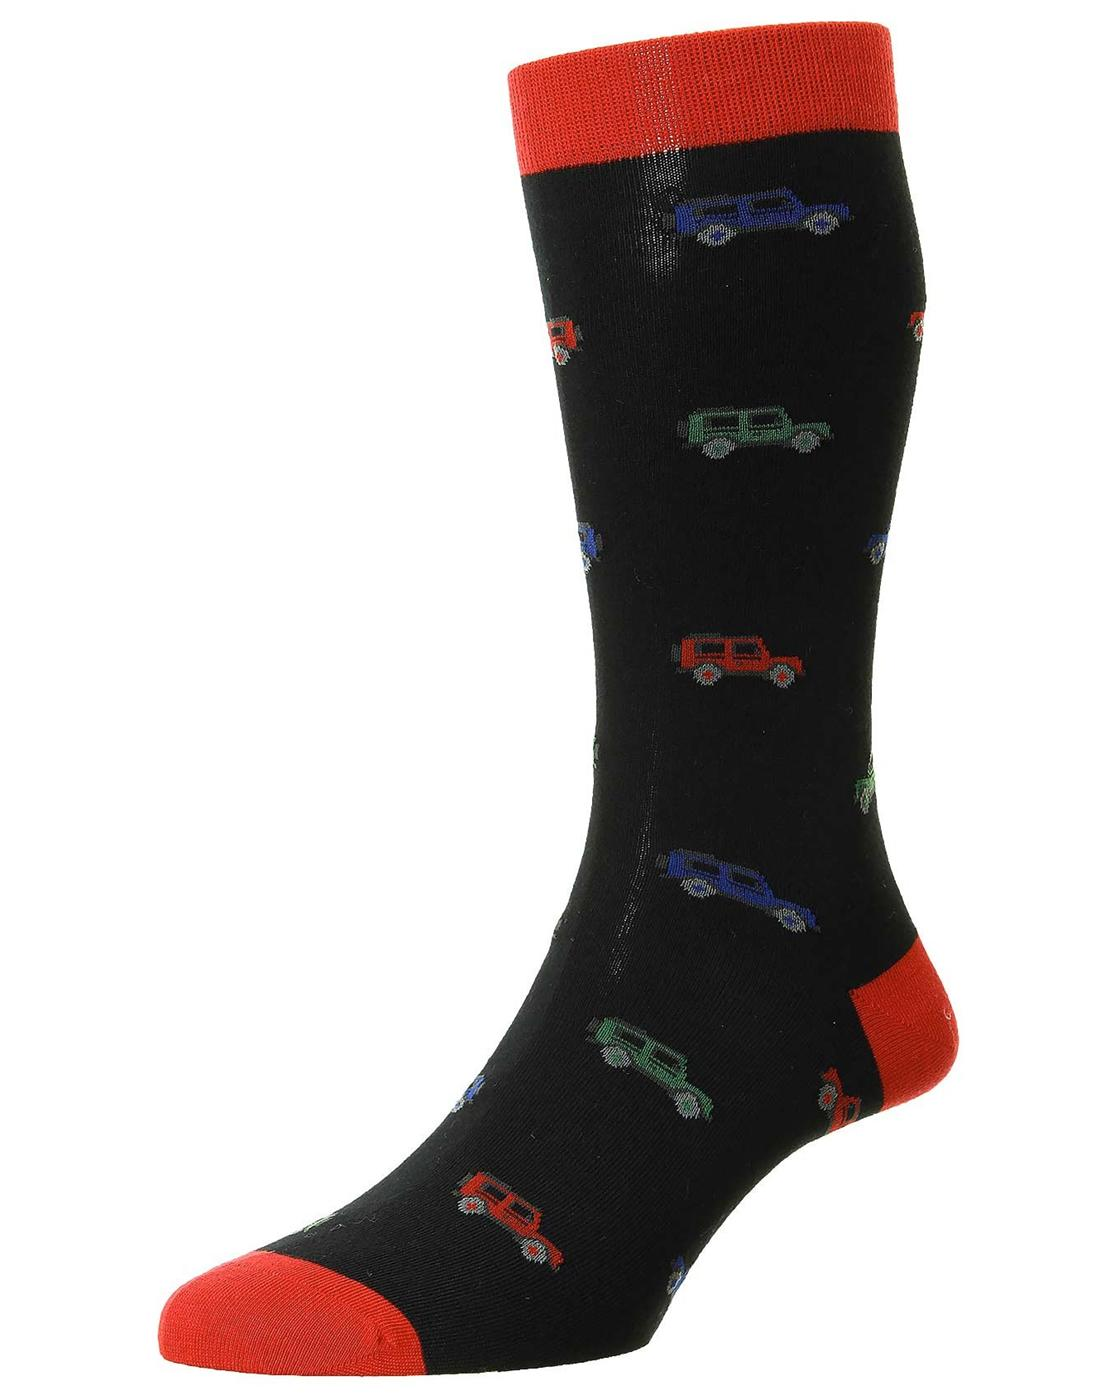 + Longshaw Cars SCOTT-NICHOL Retro Mens Socks